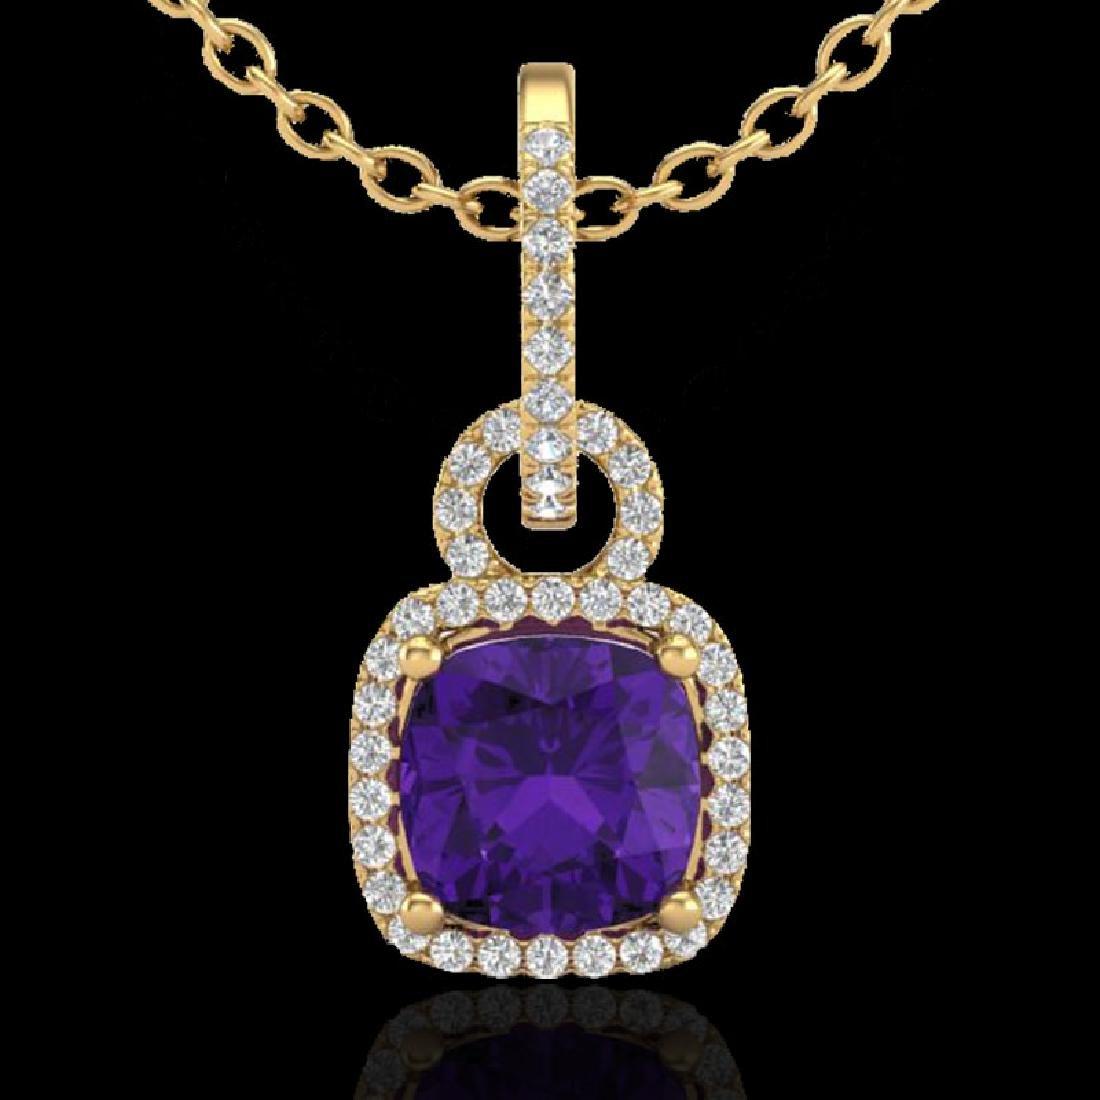 3.50 CTW Amethyst & Micro VS/SI Diamond Necklace 18K - 2